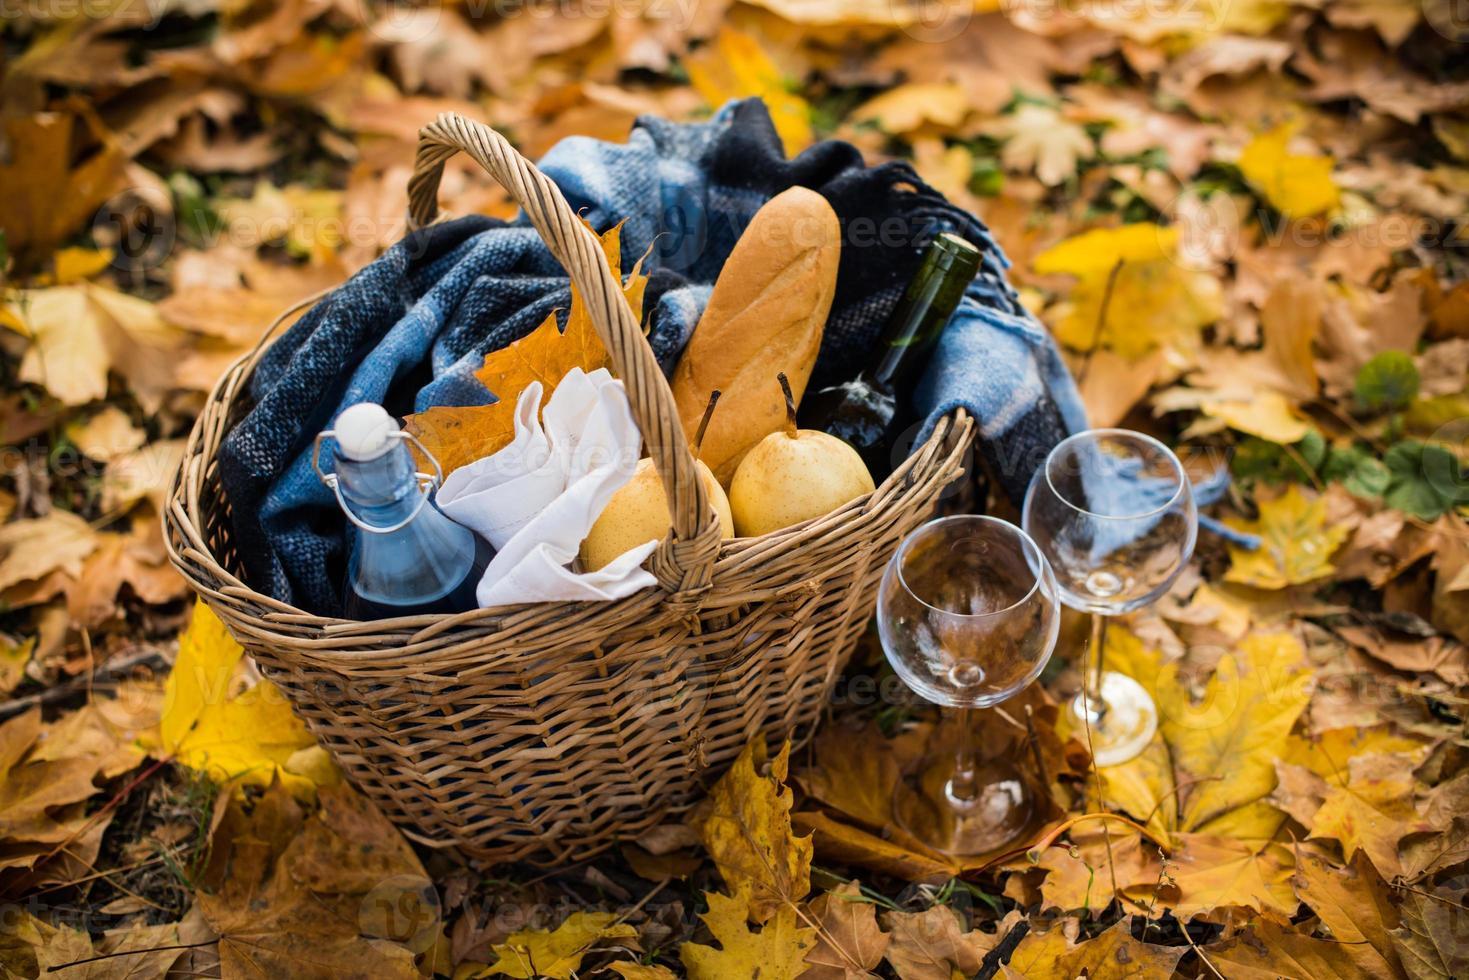 cozy autumn picnic photo